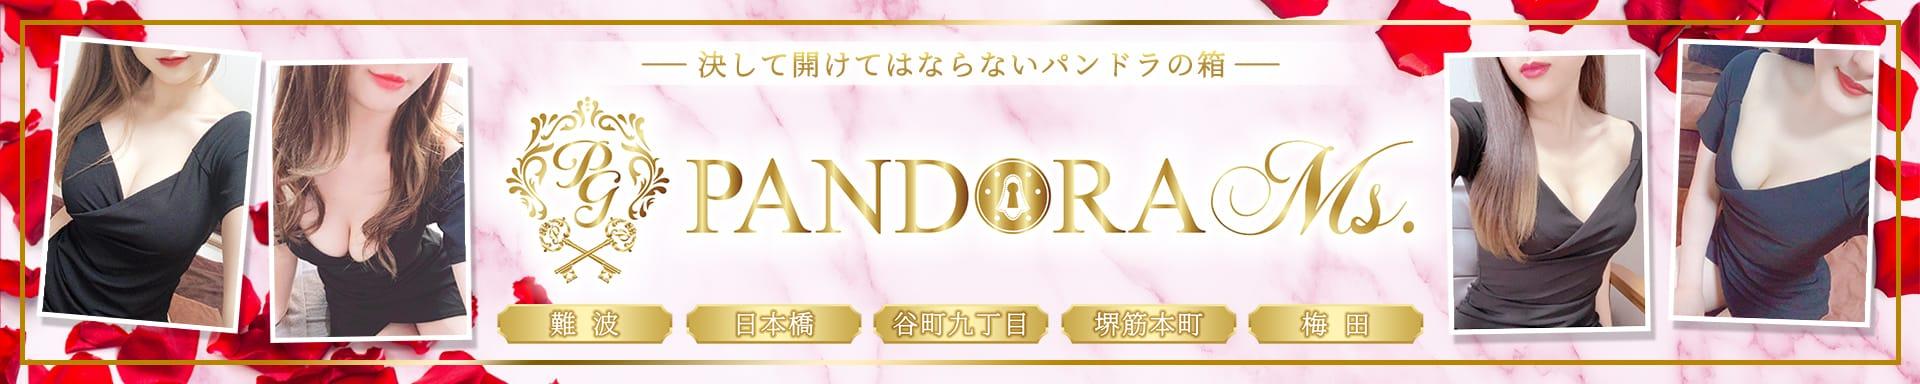 PANDORA Ms.(パンドラミズ) - 日本橋・千日前